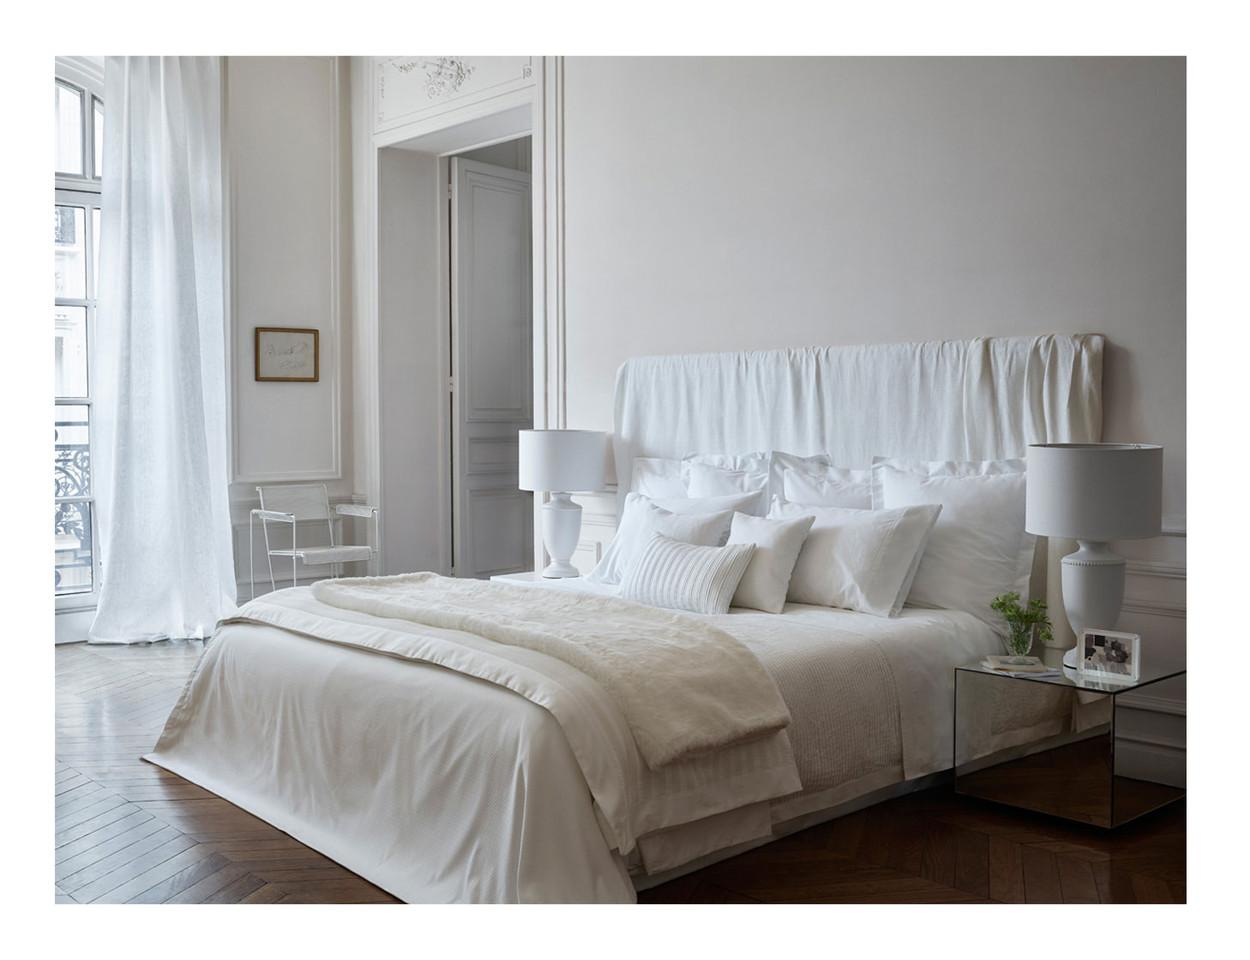 Catálogo Zara 2012 otoño invierno | 超。魔豆 | Pinterest ...